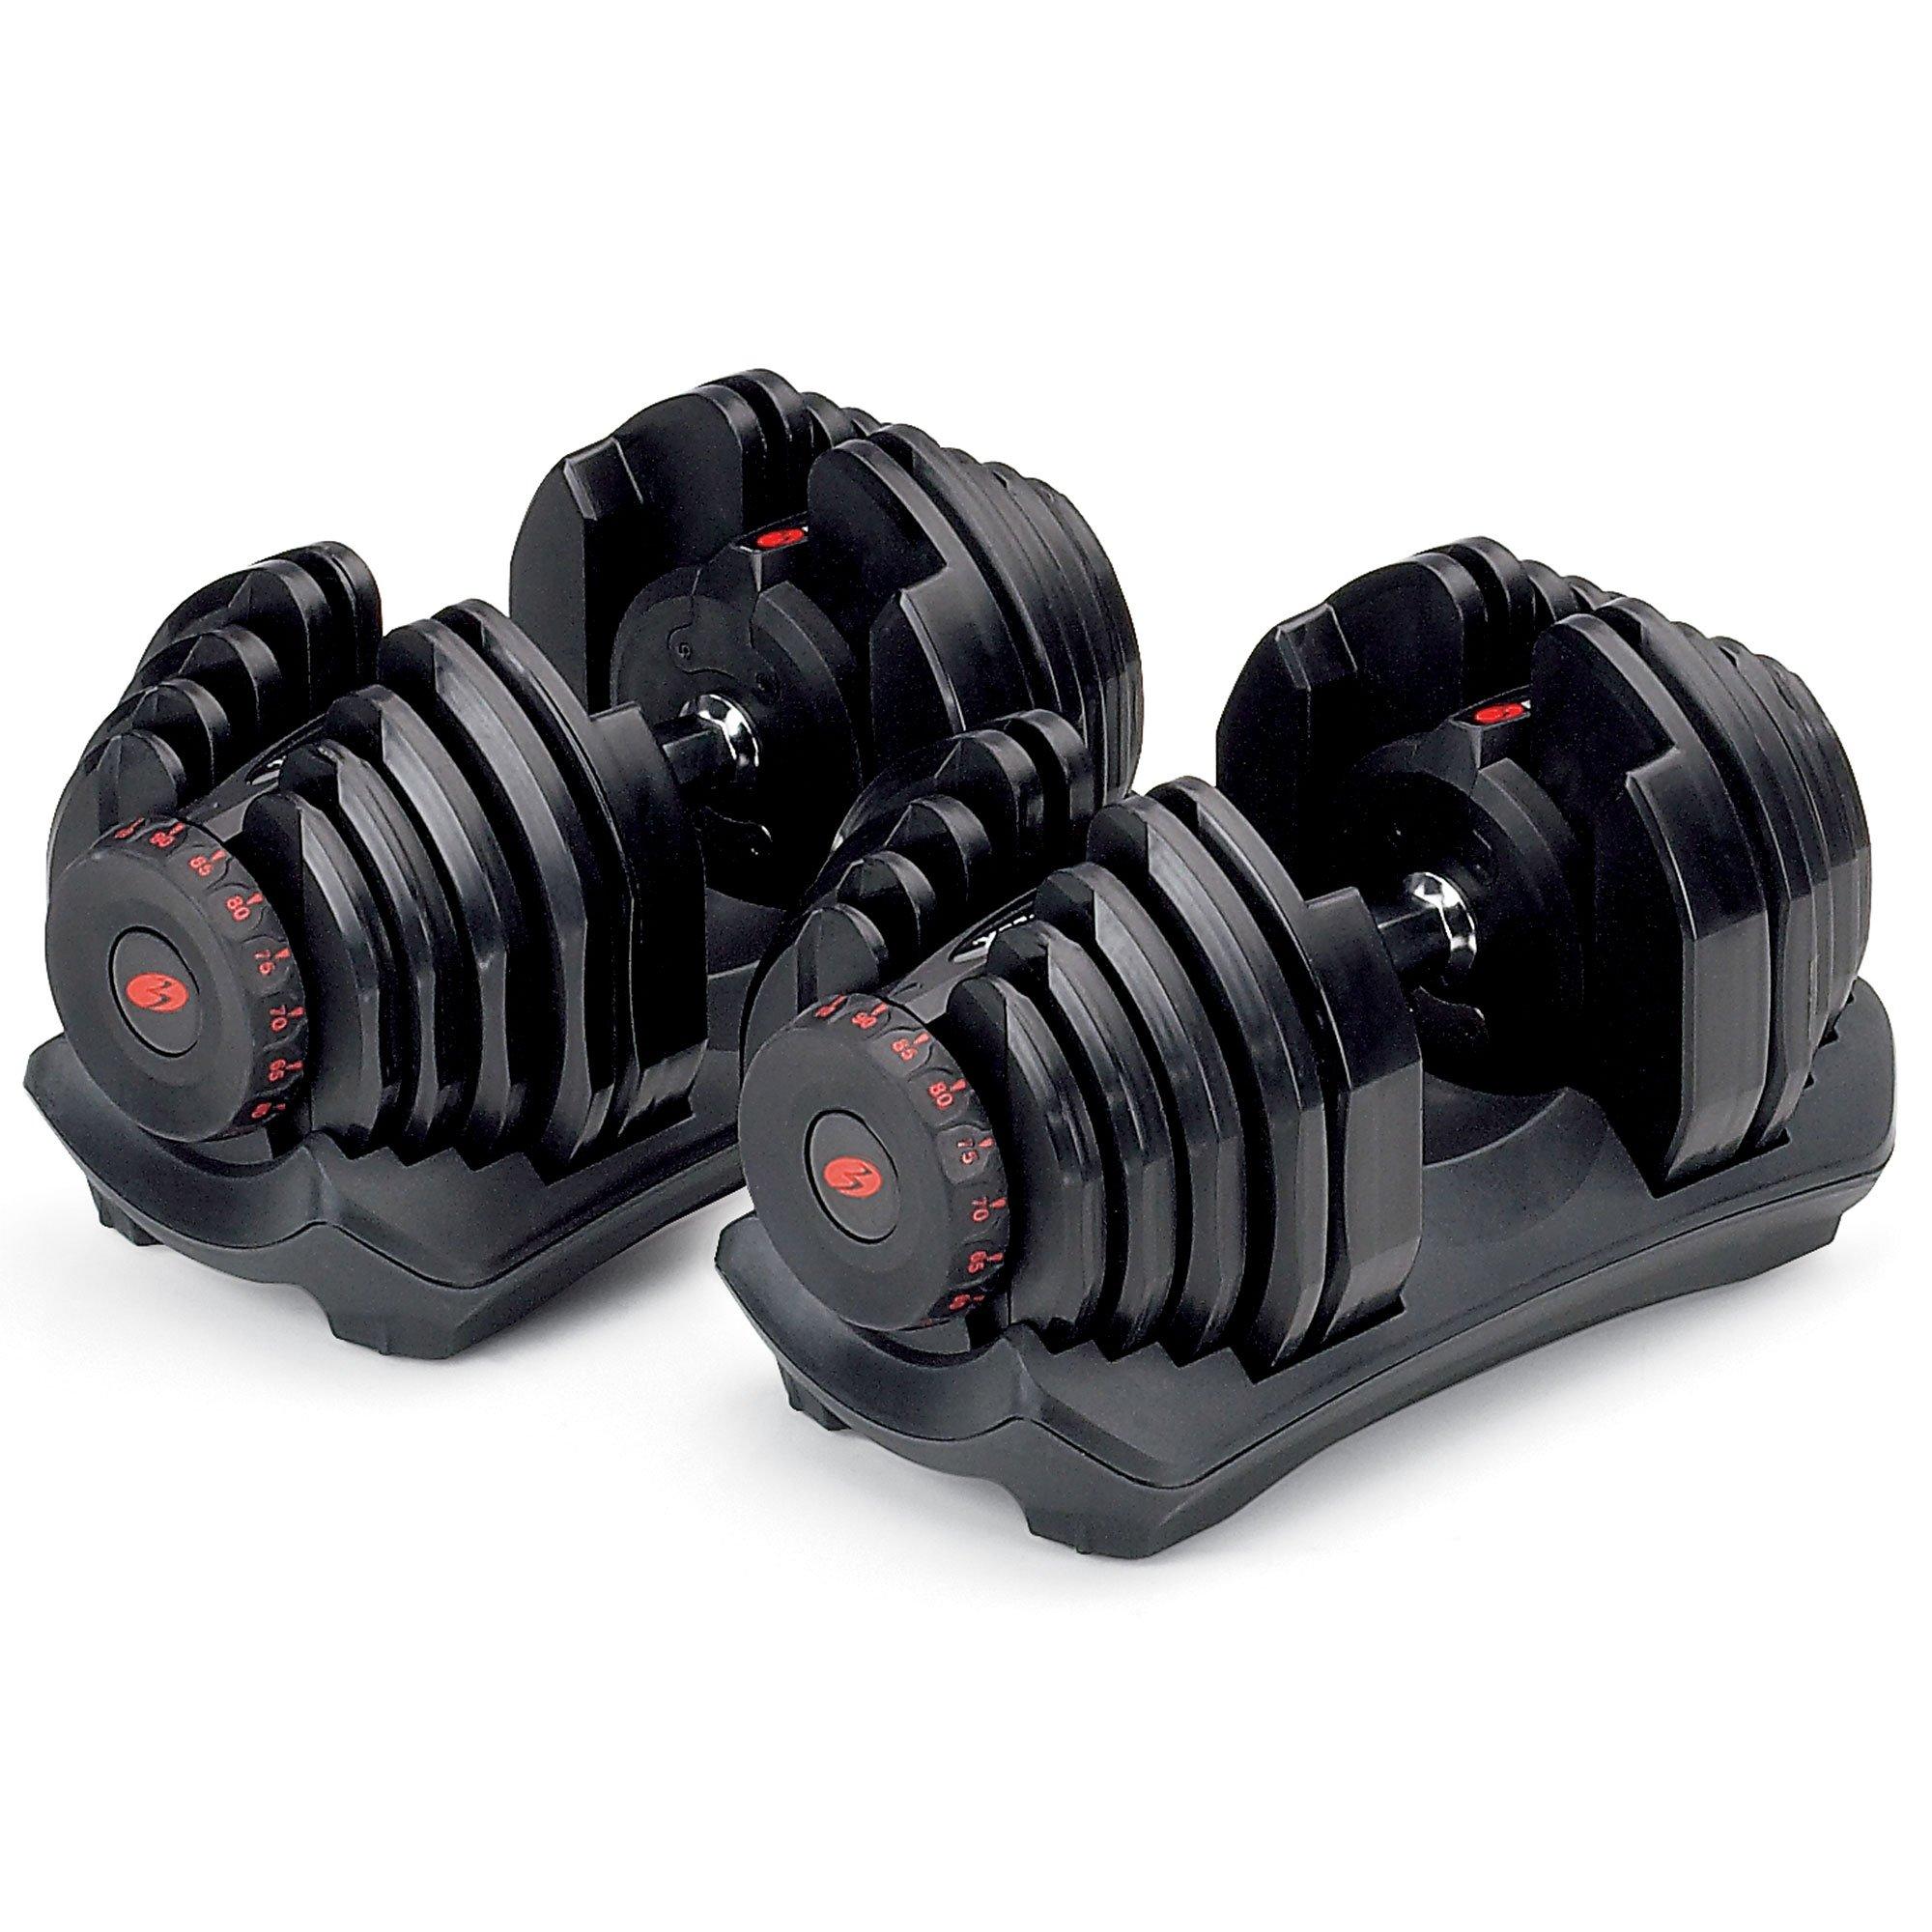 Bowflex SelectTech 1090 Adjustable Dumbbell (Pair) by Bowflex